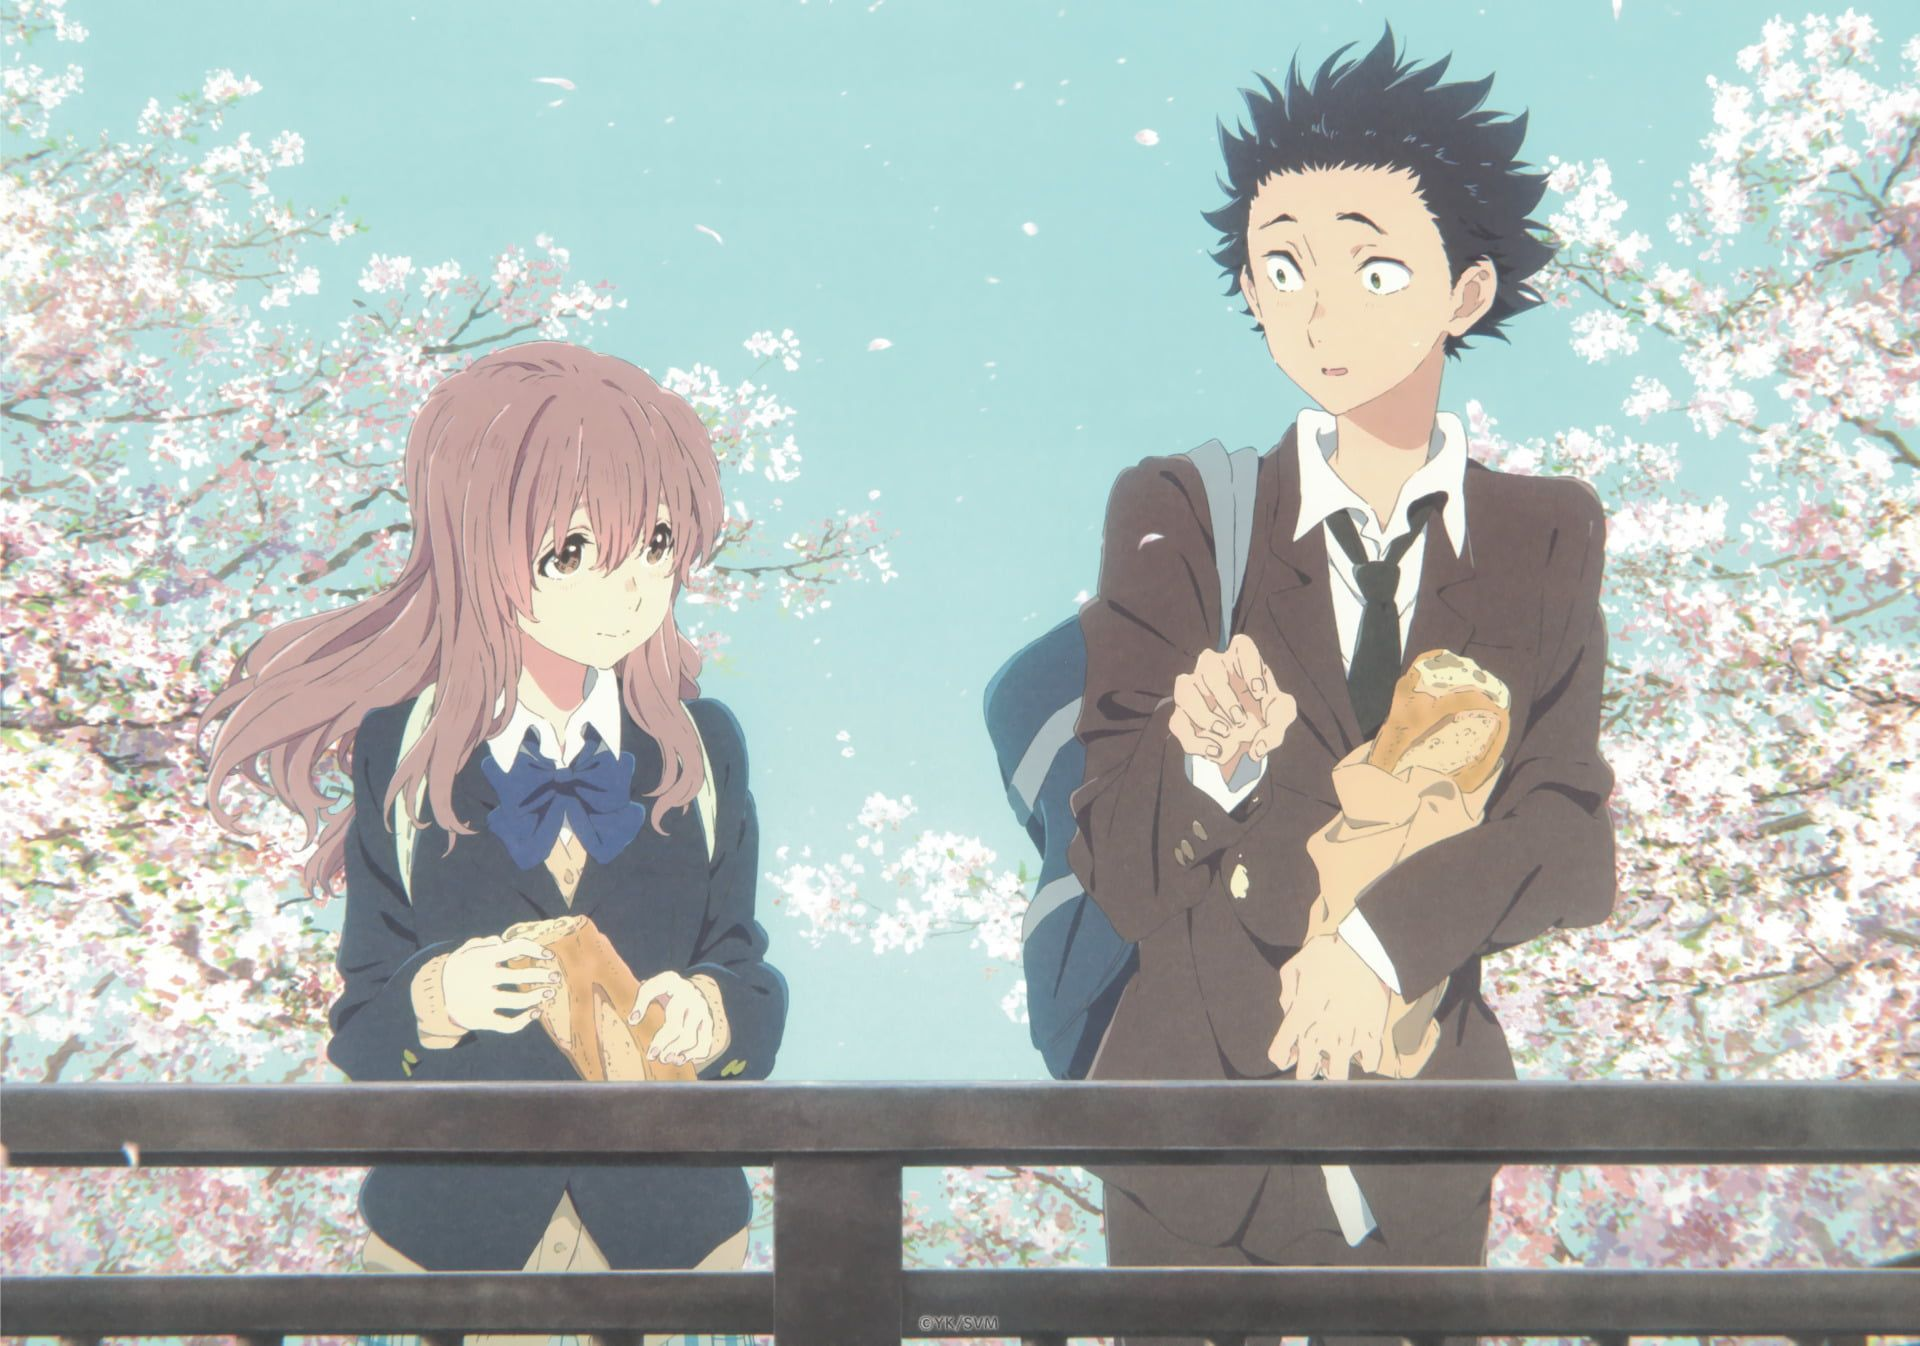 HD wallpaper: A Silent Voice illustration, Anime, Koe No Katachi, Shouko Nishimiya